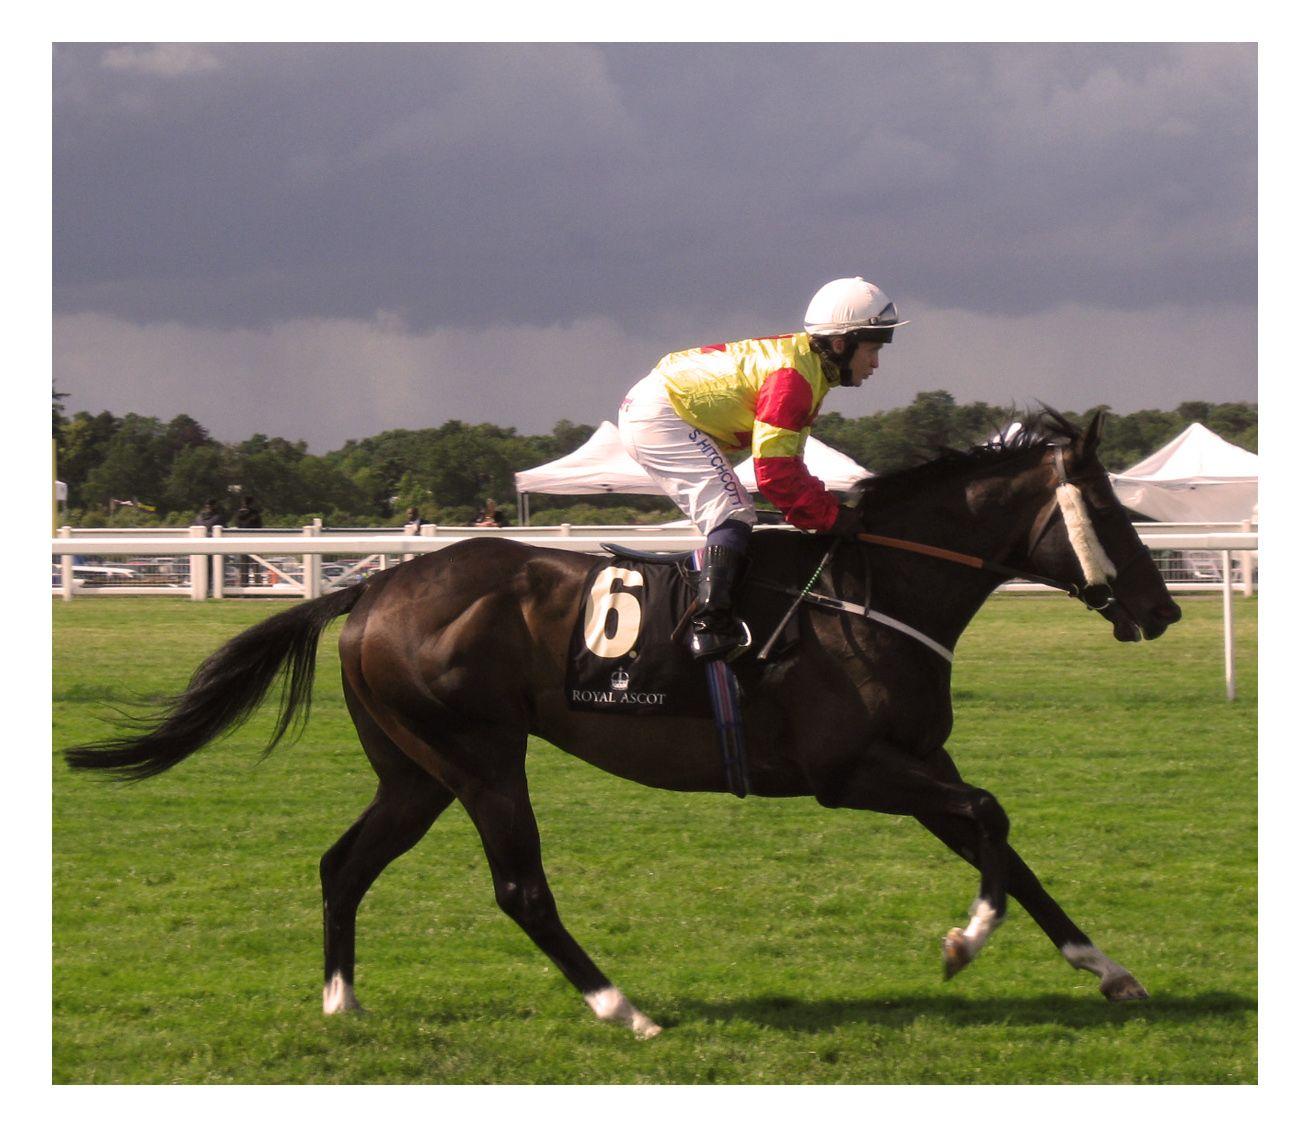 ascot horse